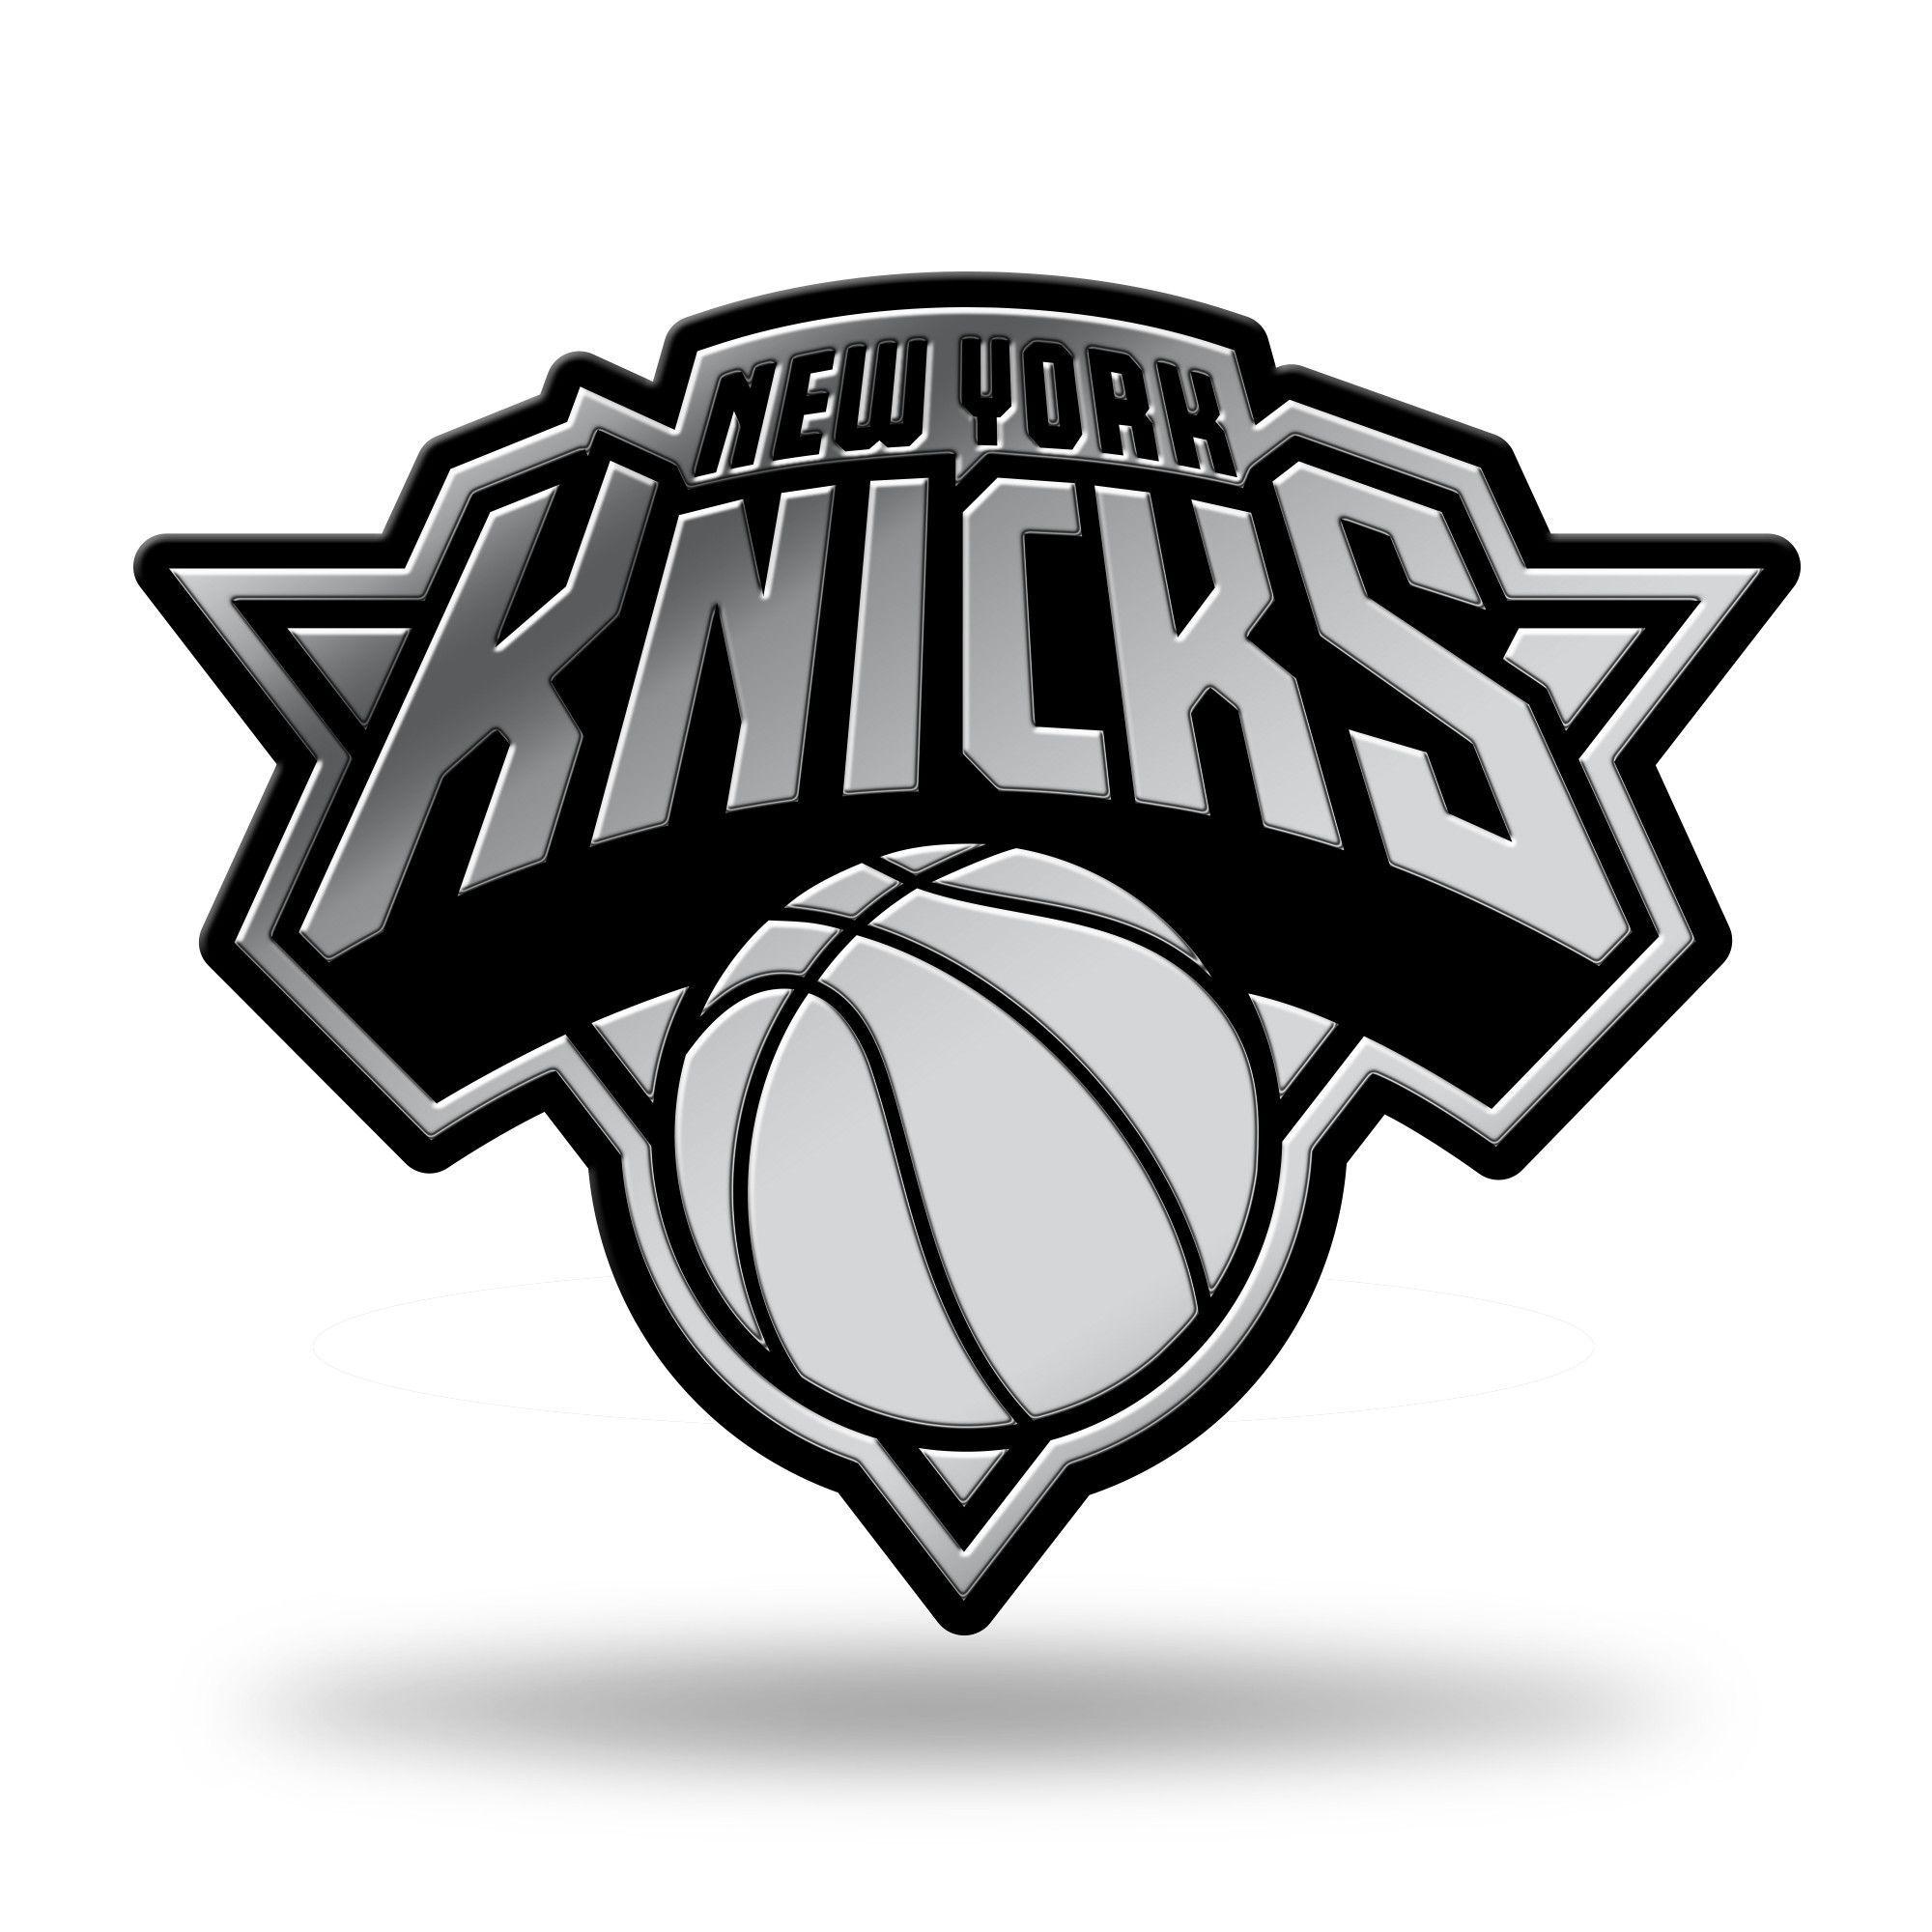 New York Knicks Logo 3D Chrome Auto Emblem NEW!! Truck or